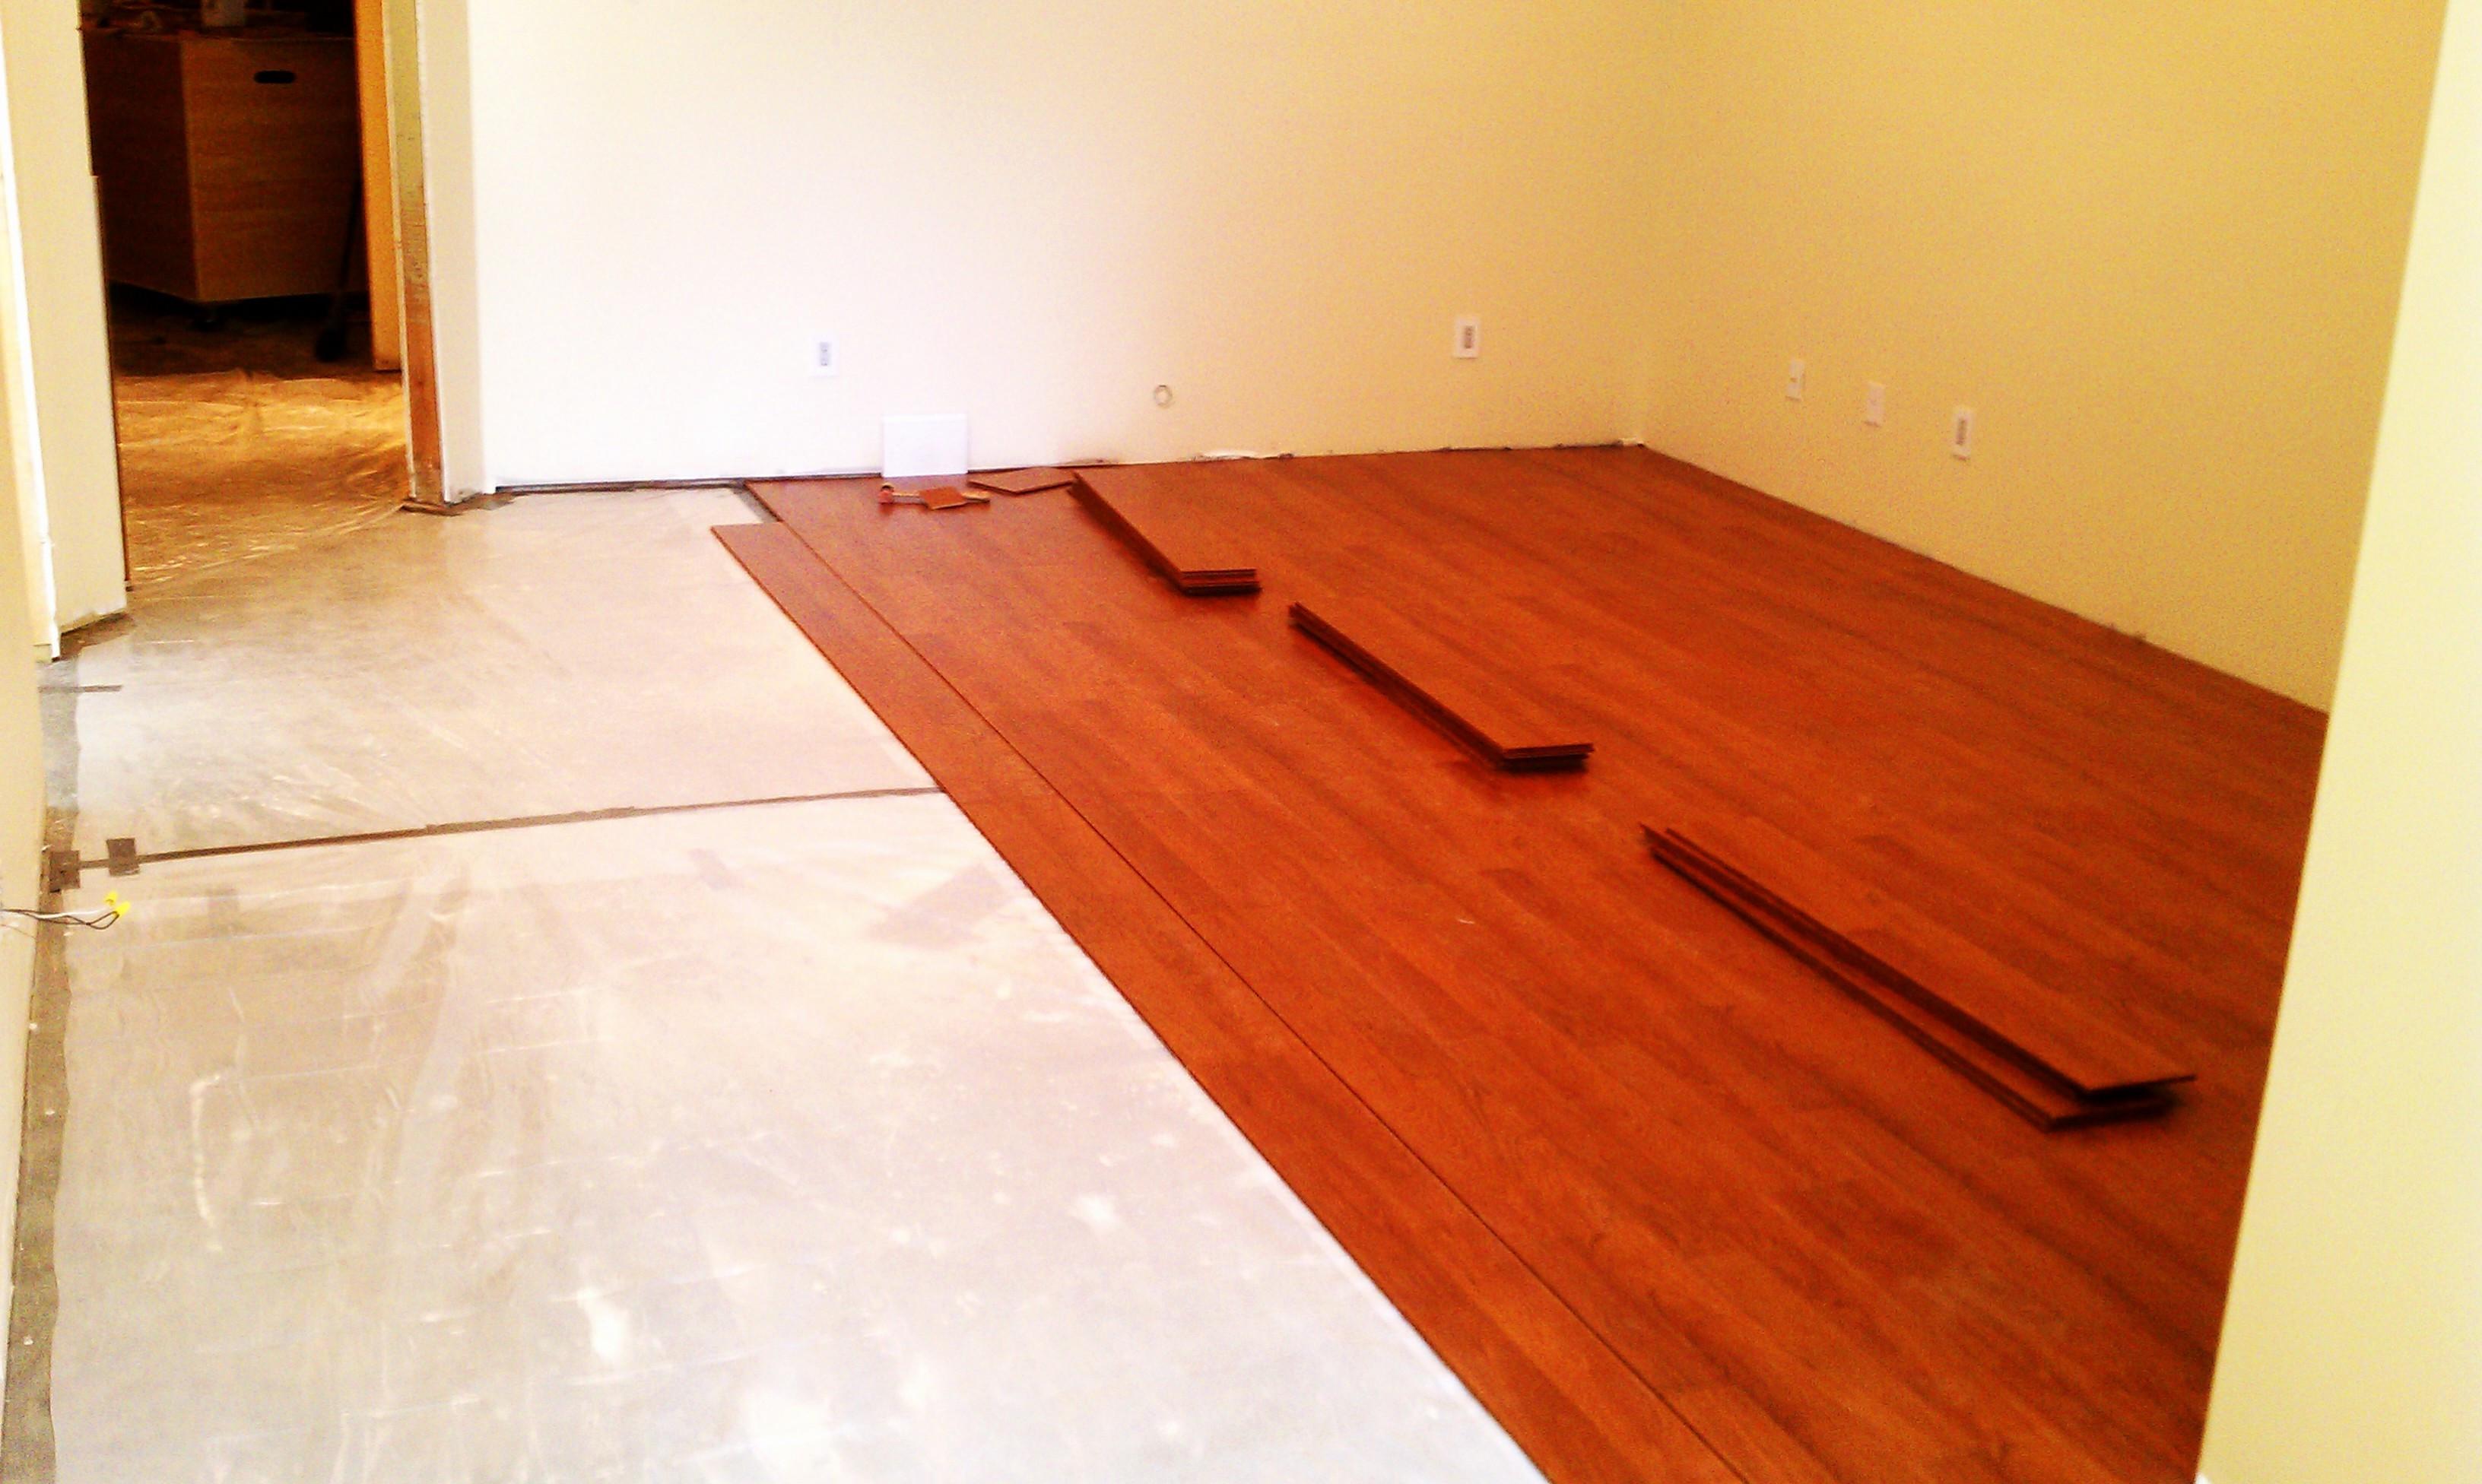 hardwood floor sanding vacuum of 14 new average cost for hardwood floors stock dizpos com intended for average cost for hardwood floors fresh 50 new average cost to refinish hardwood floors 50 s